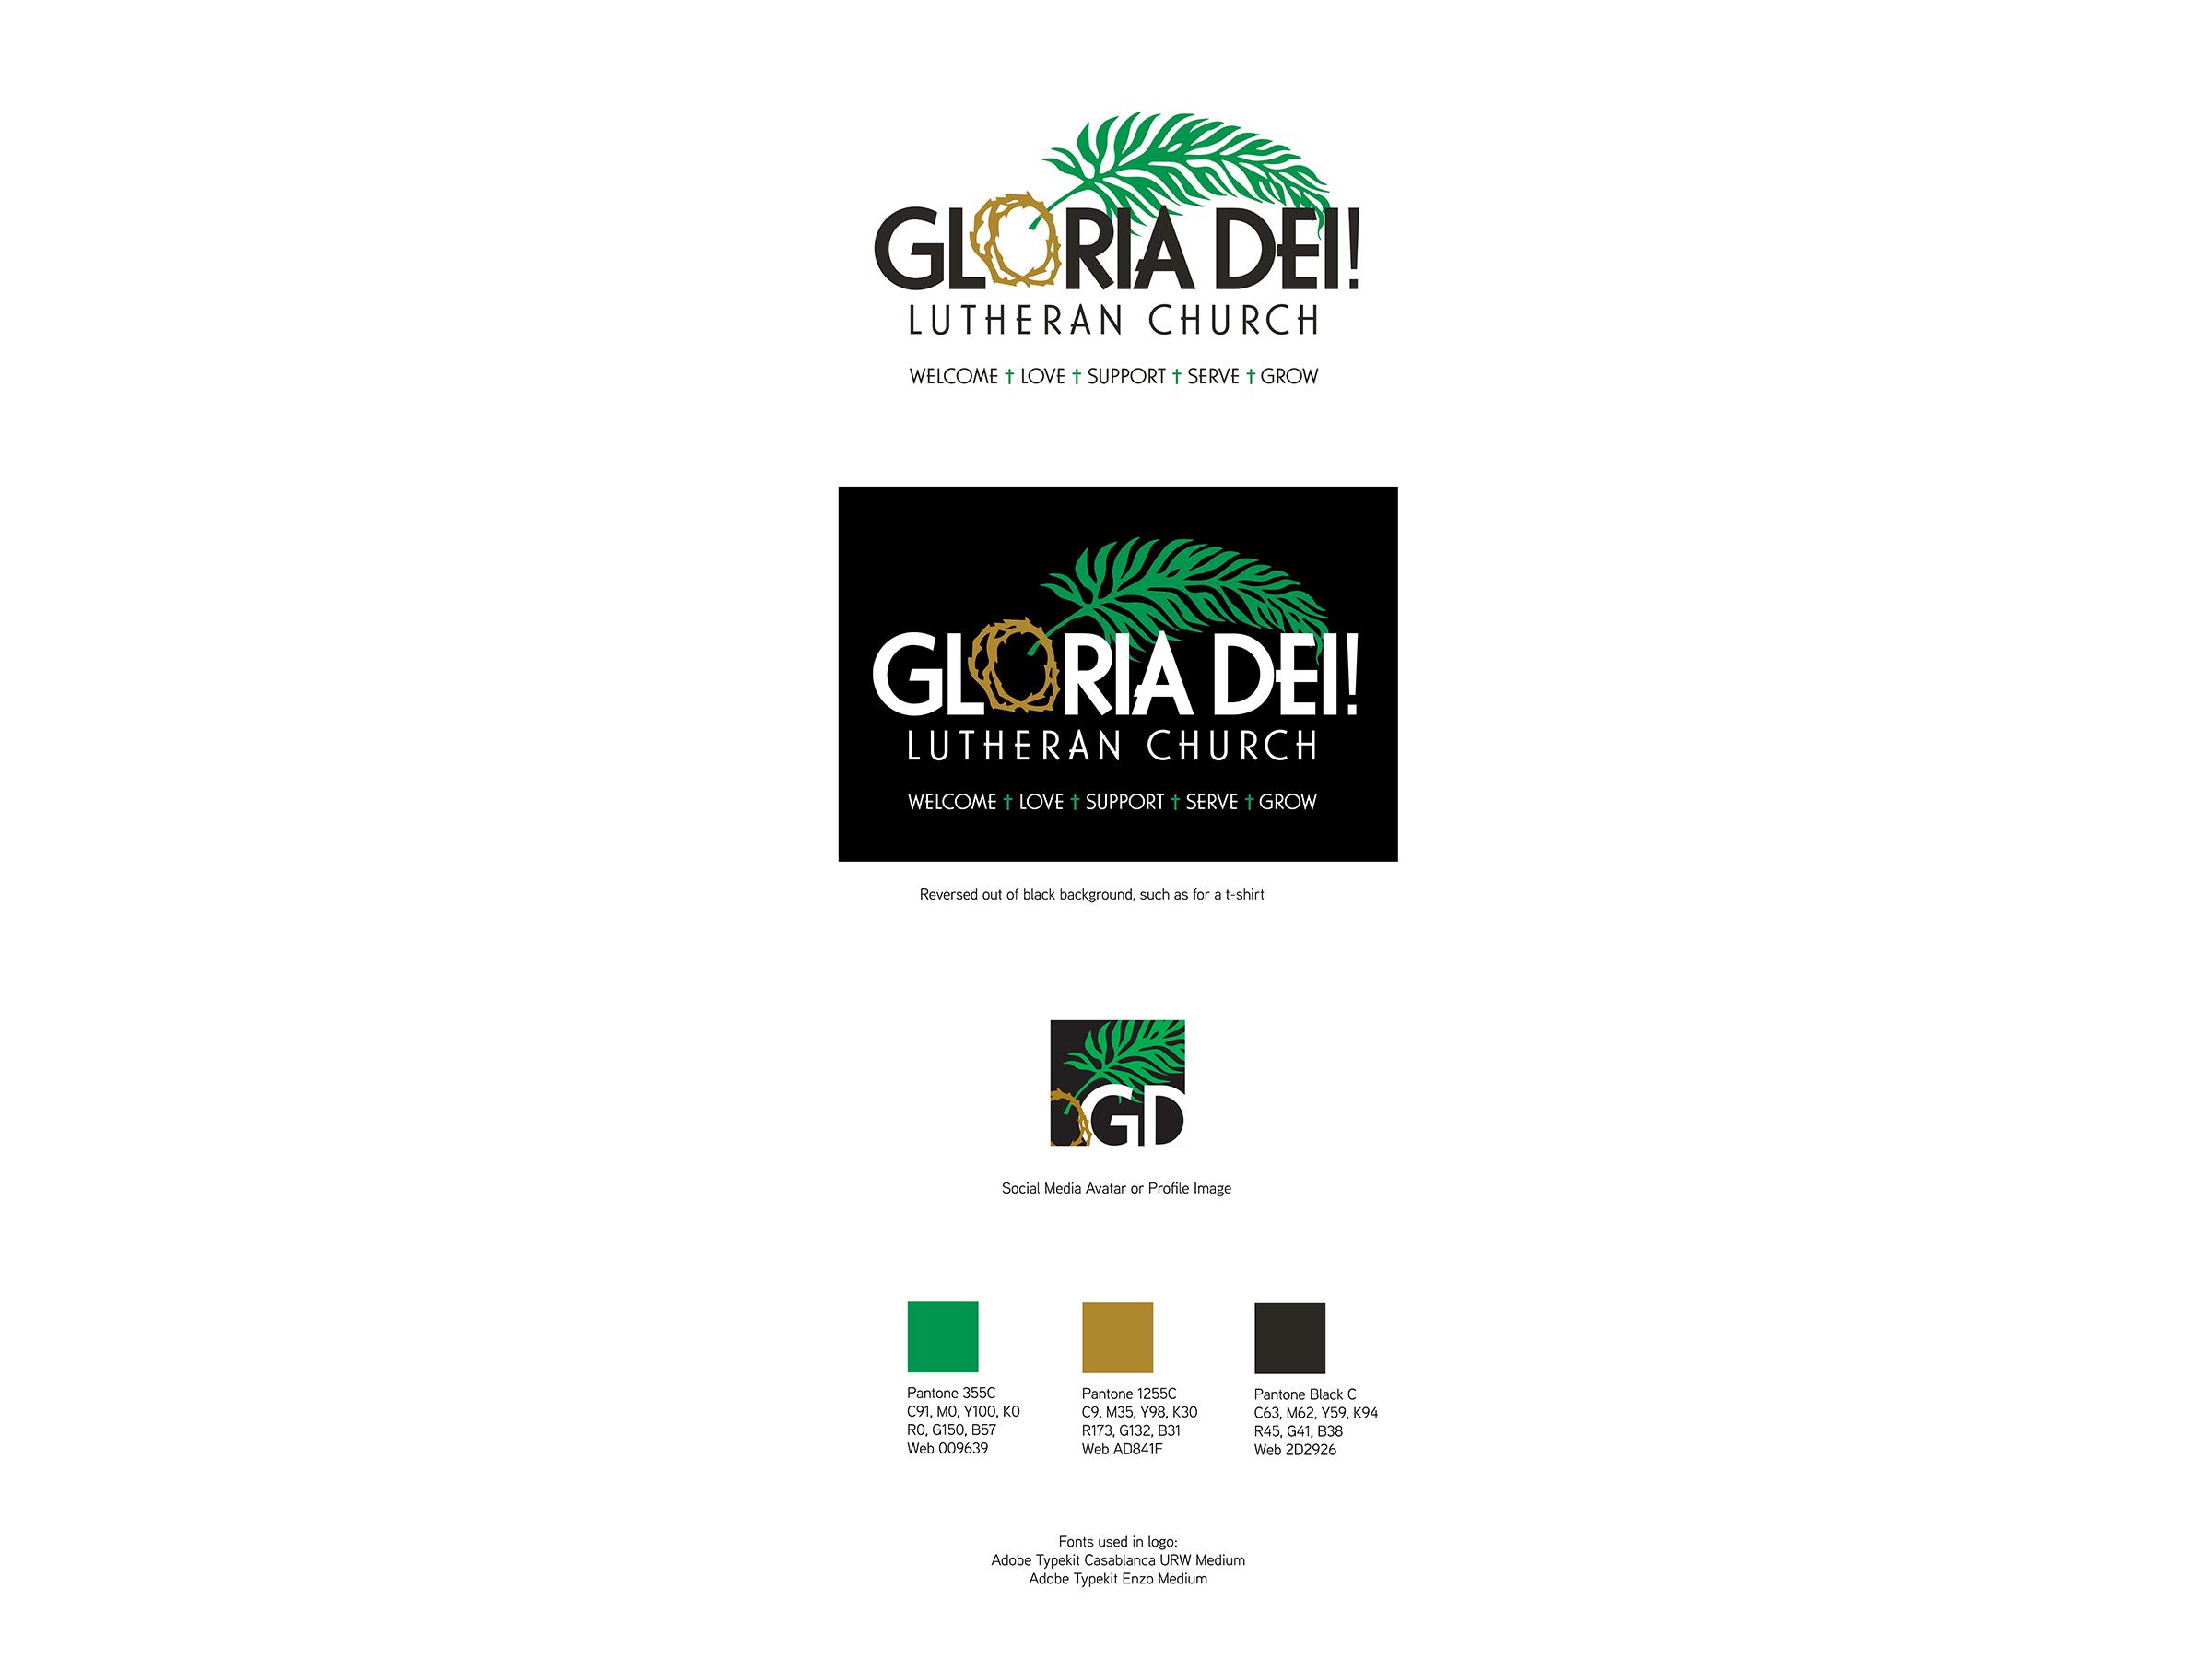 Gloria Dei Branding Specs